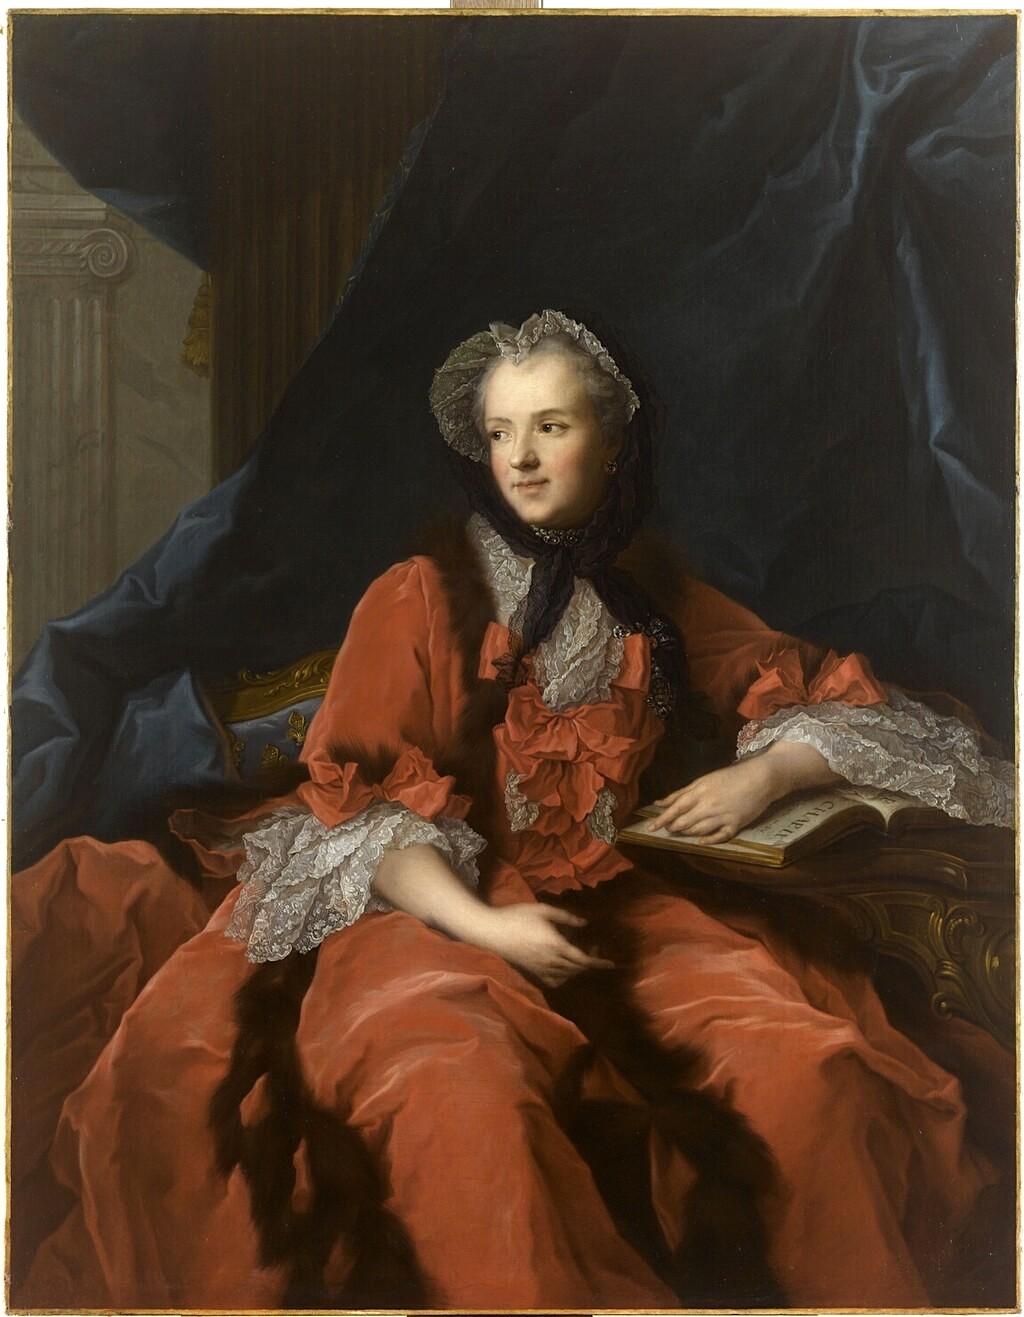 La reine Marie Leszczynska - Page 2 Imagep76